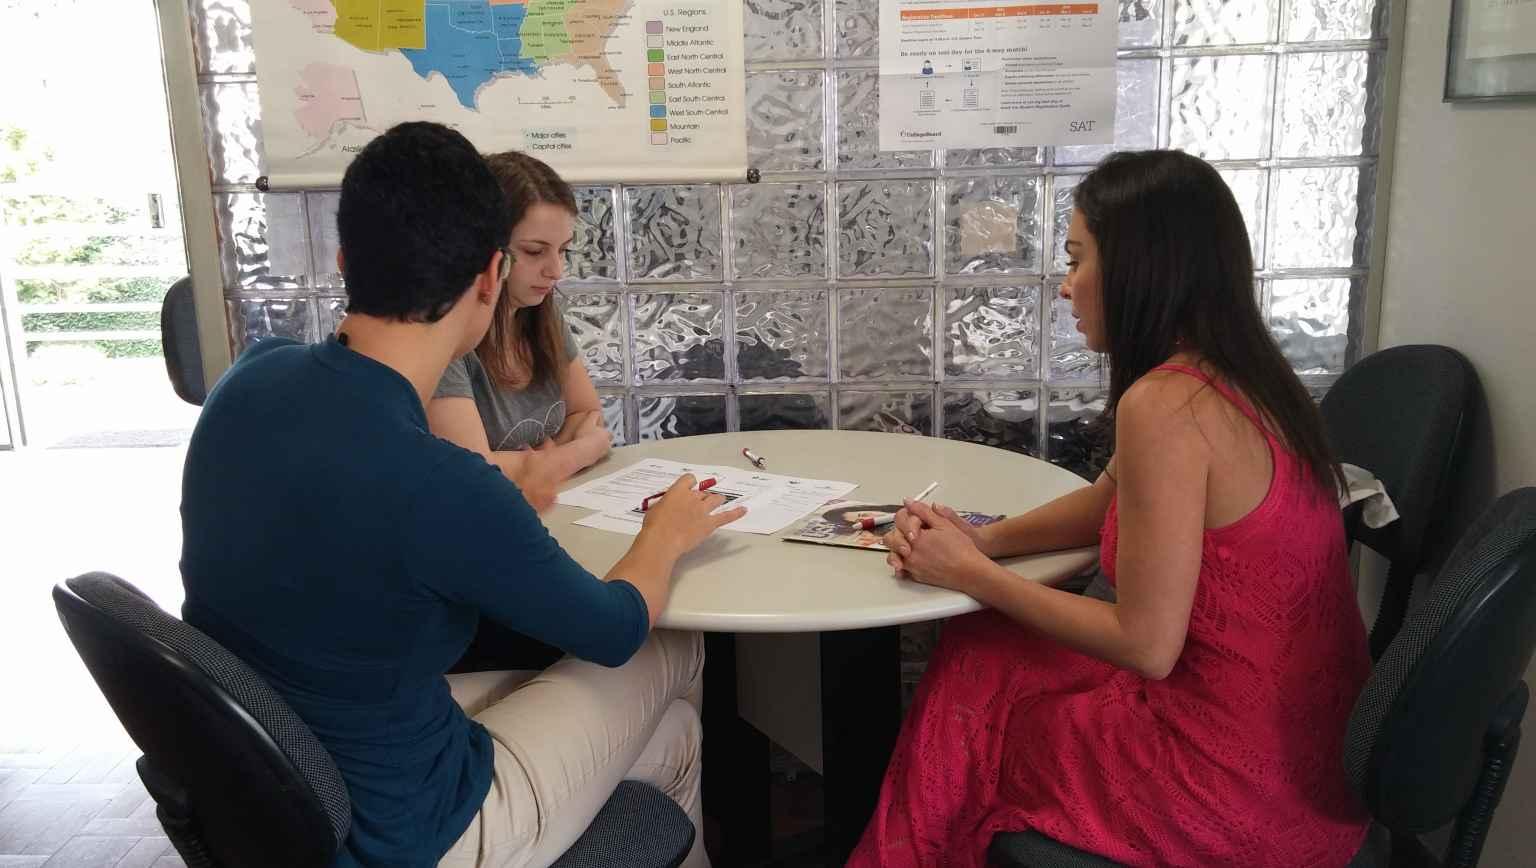 Avising international students in the USA